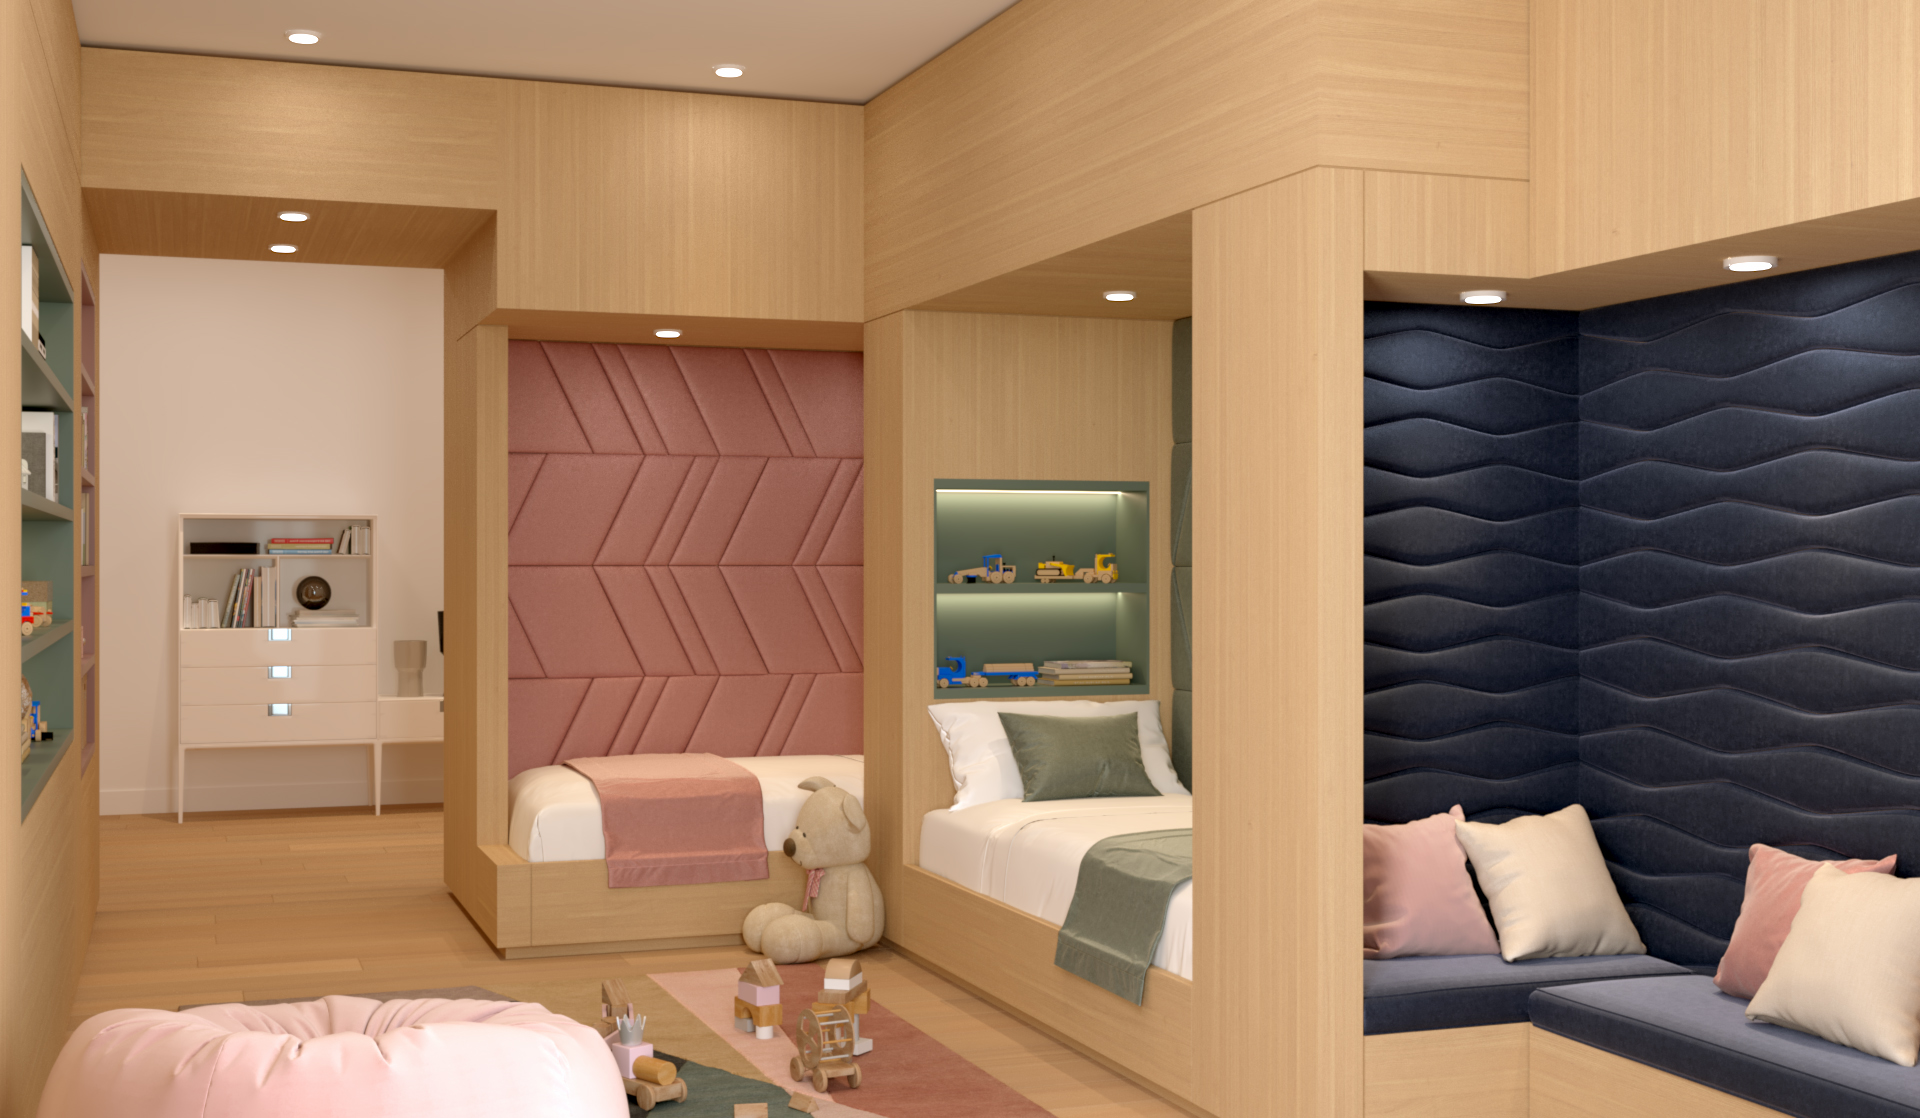 Dormitorio_Infantil_002